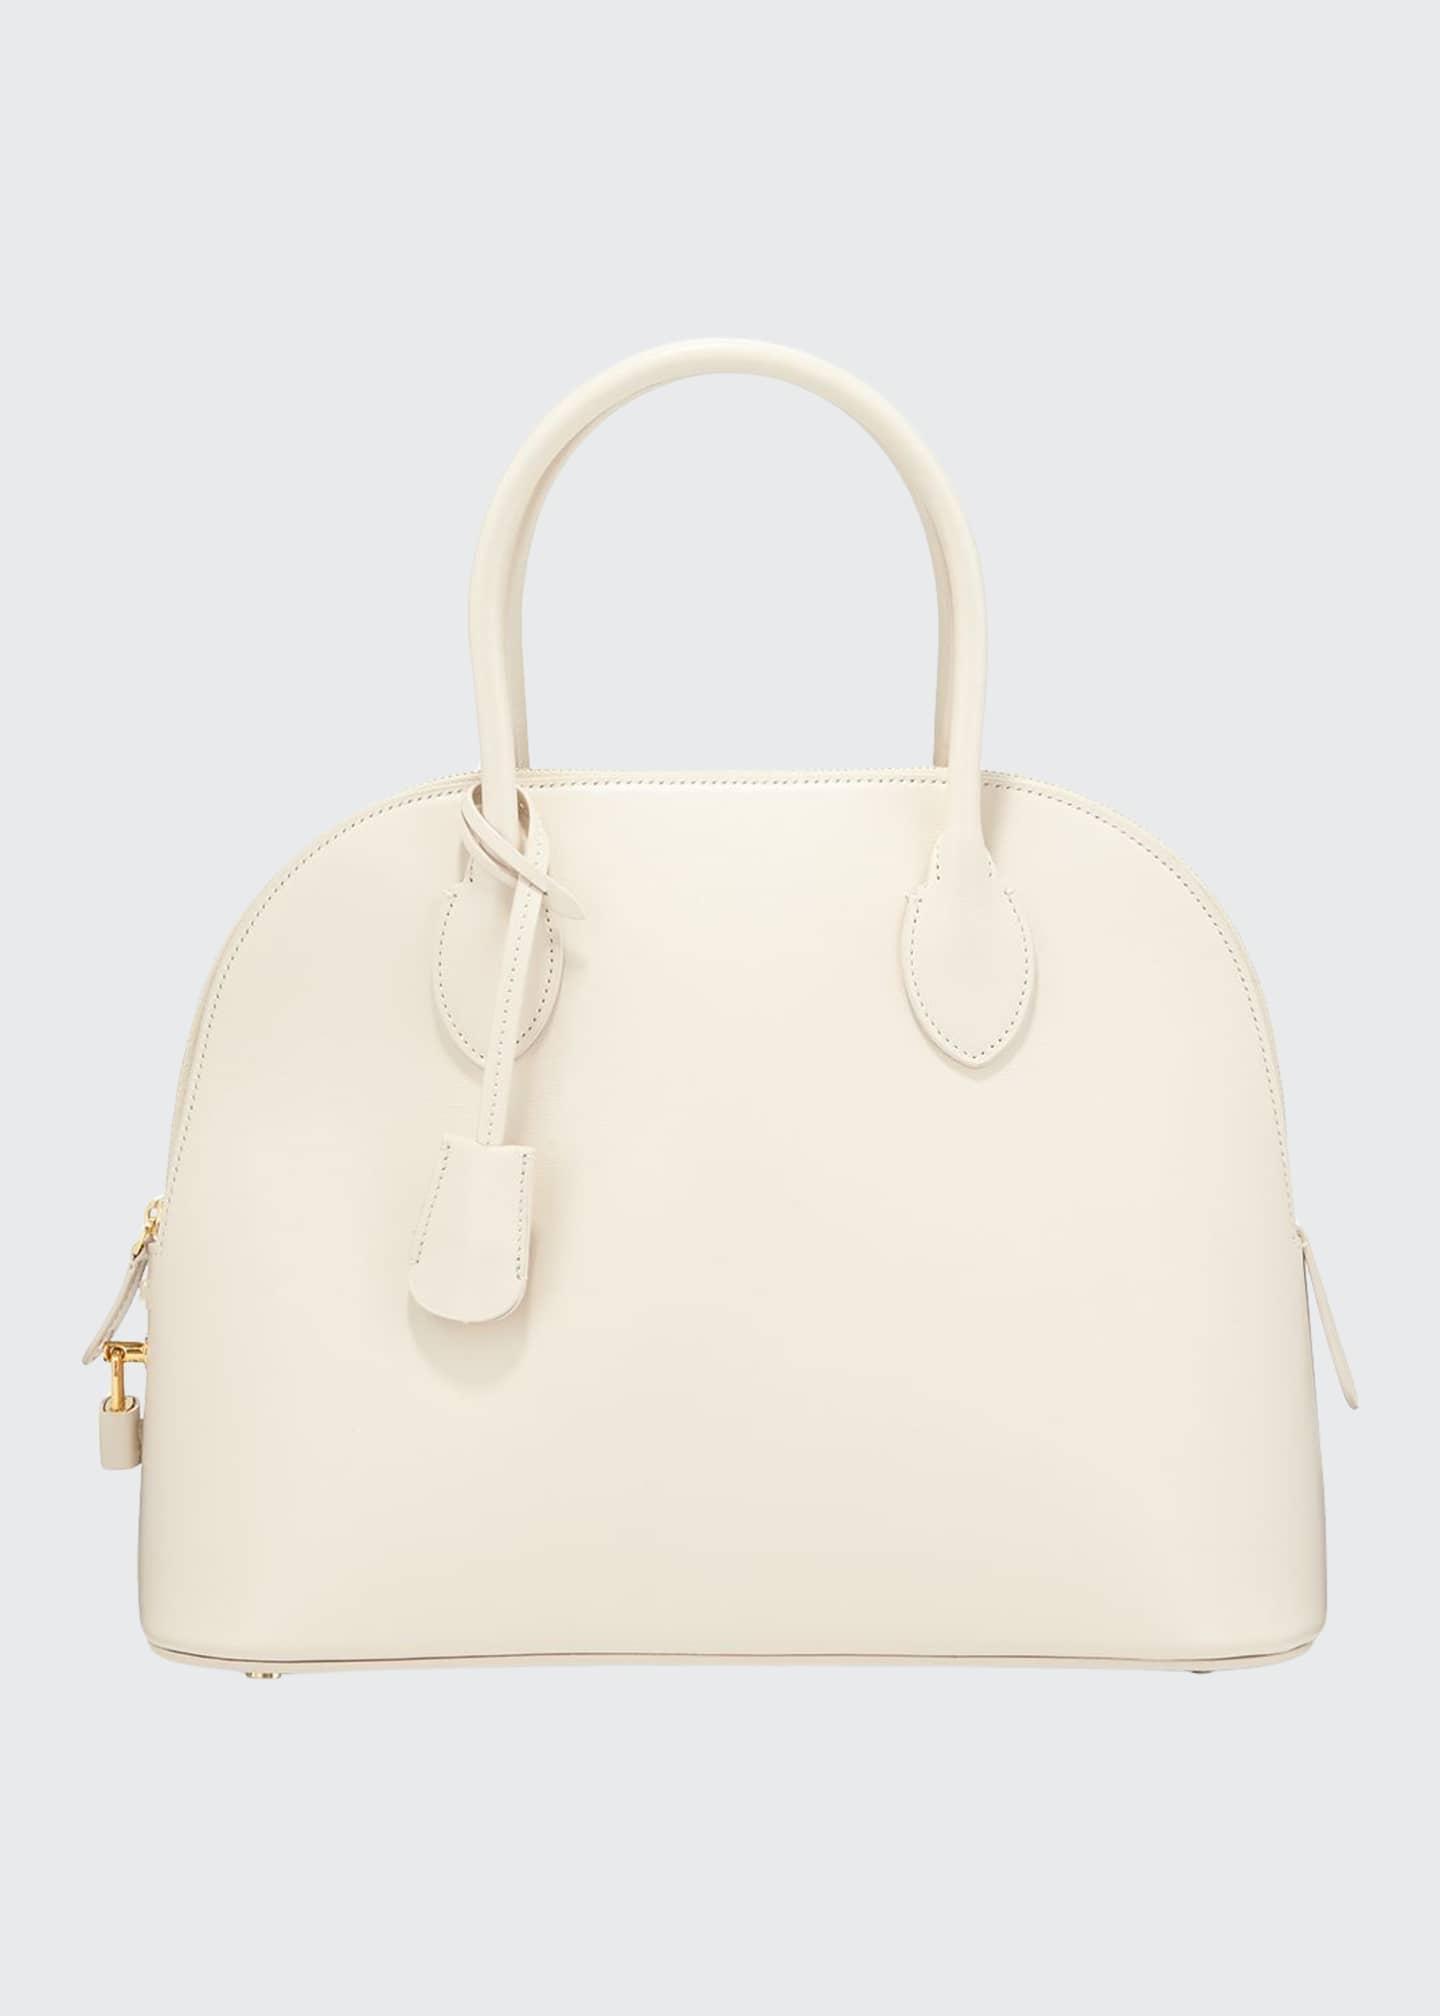 THE ROW Lady Bag in Soft Box Calf